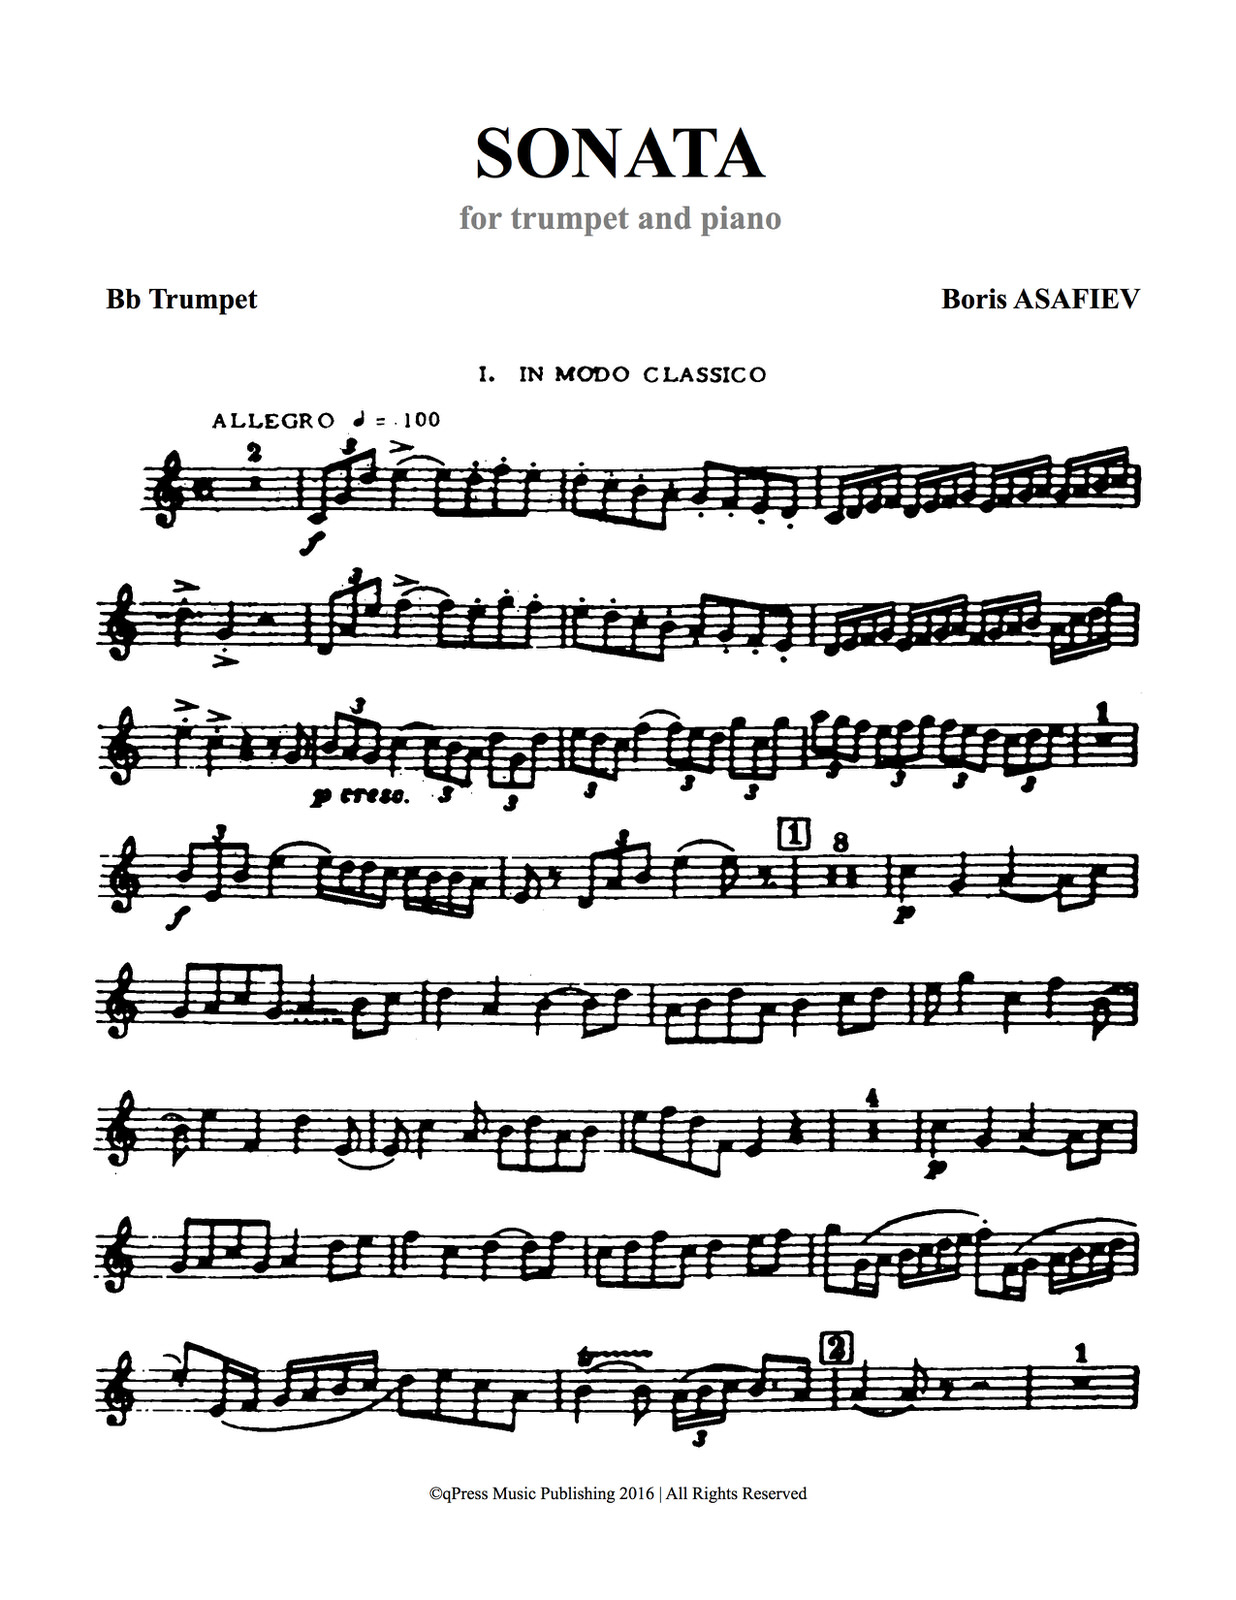 asafiev-sonata-for-trumpet-2